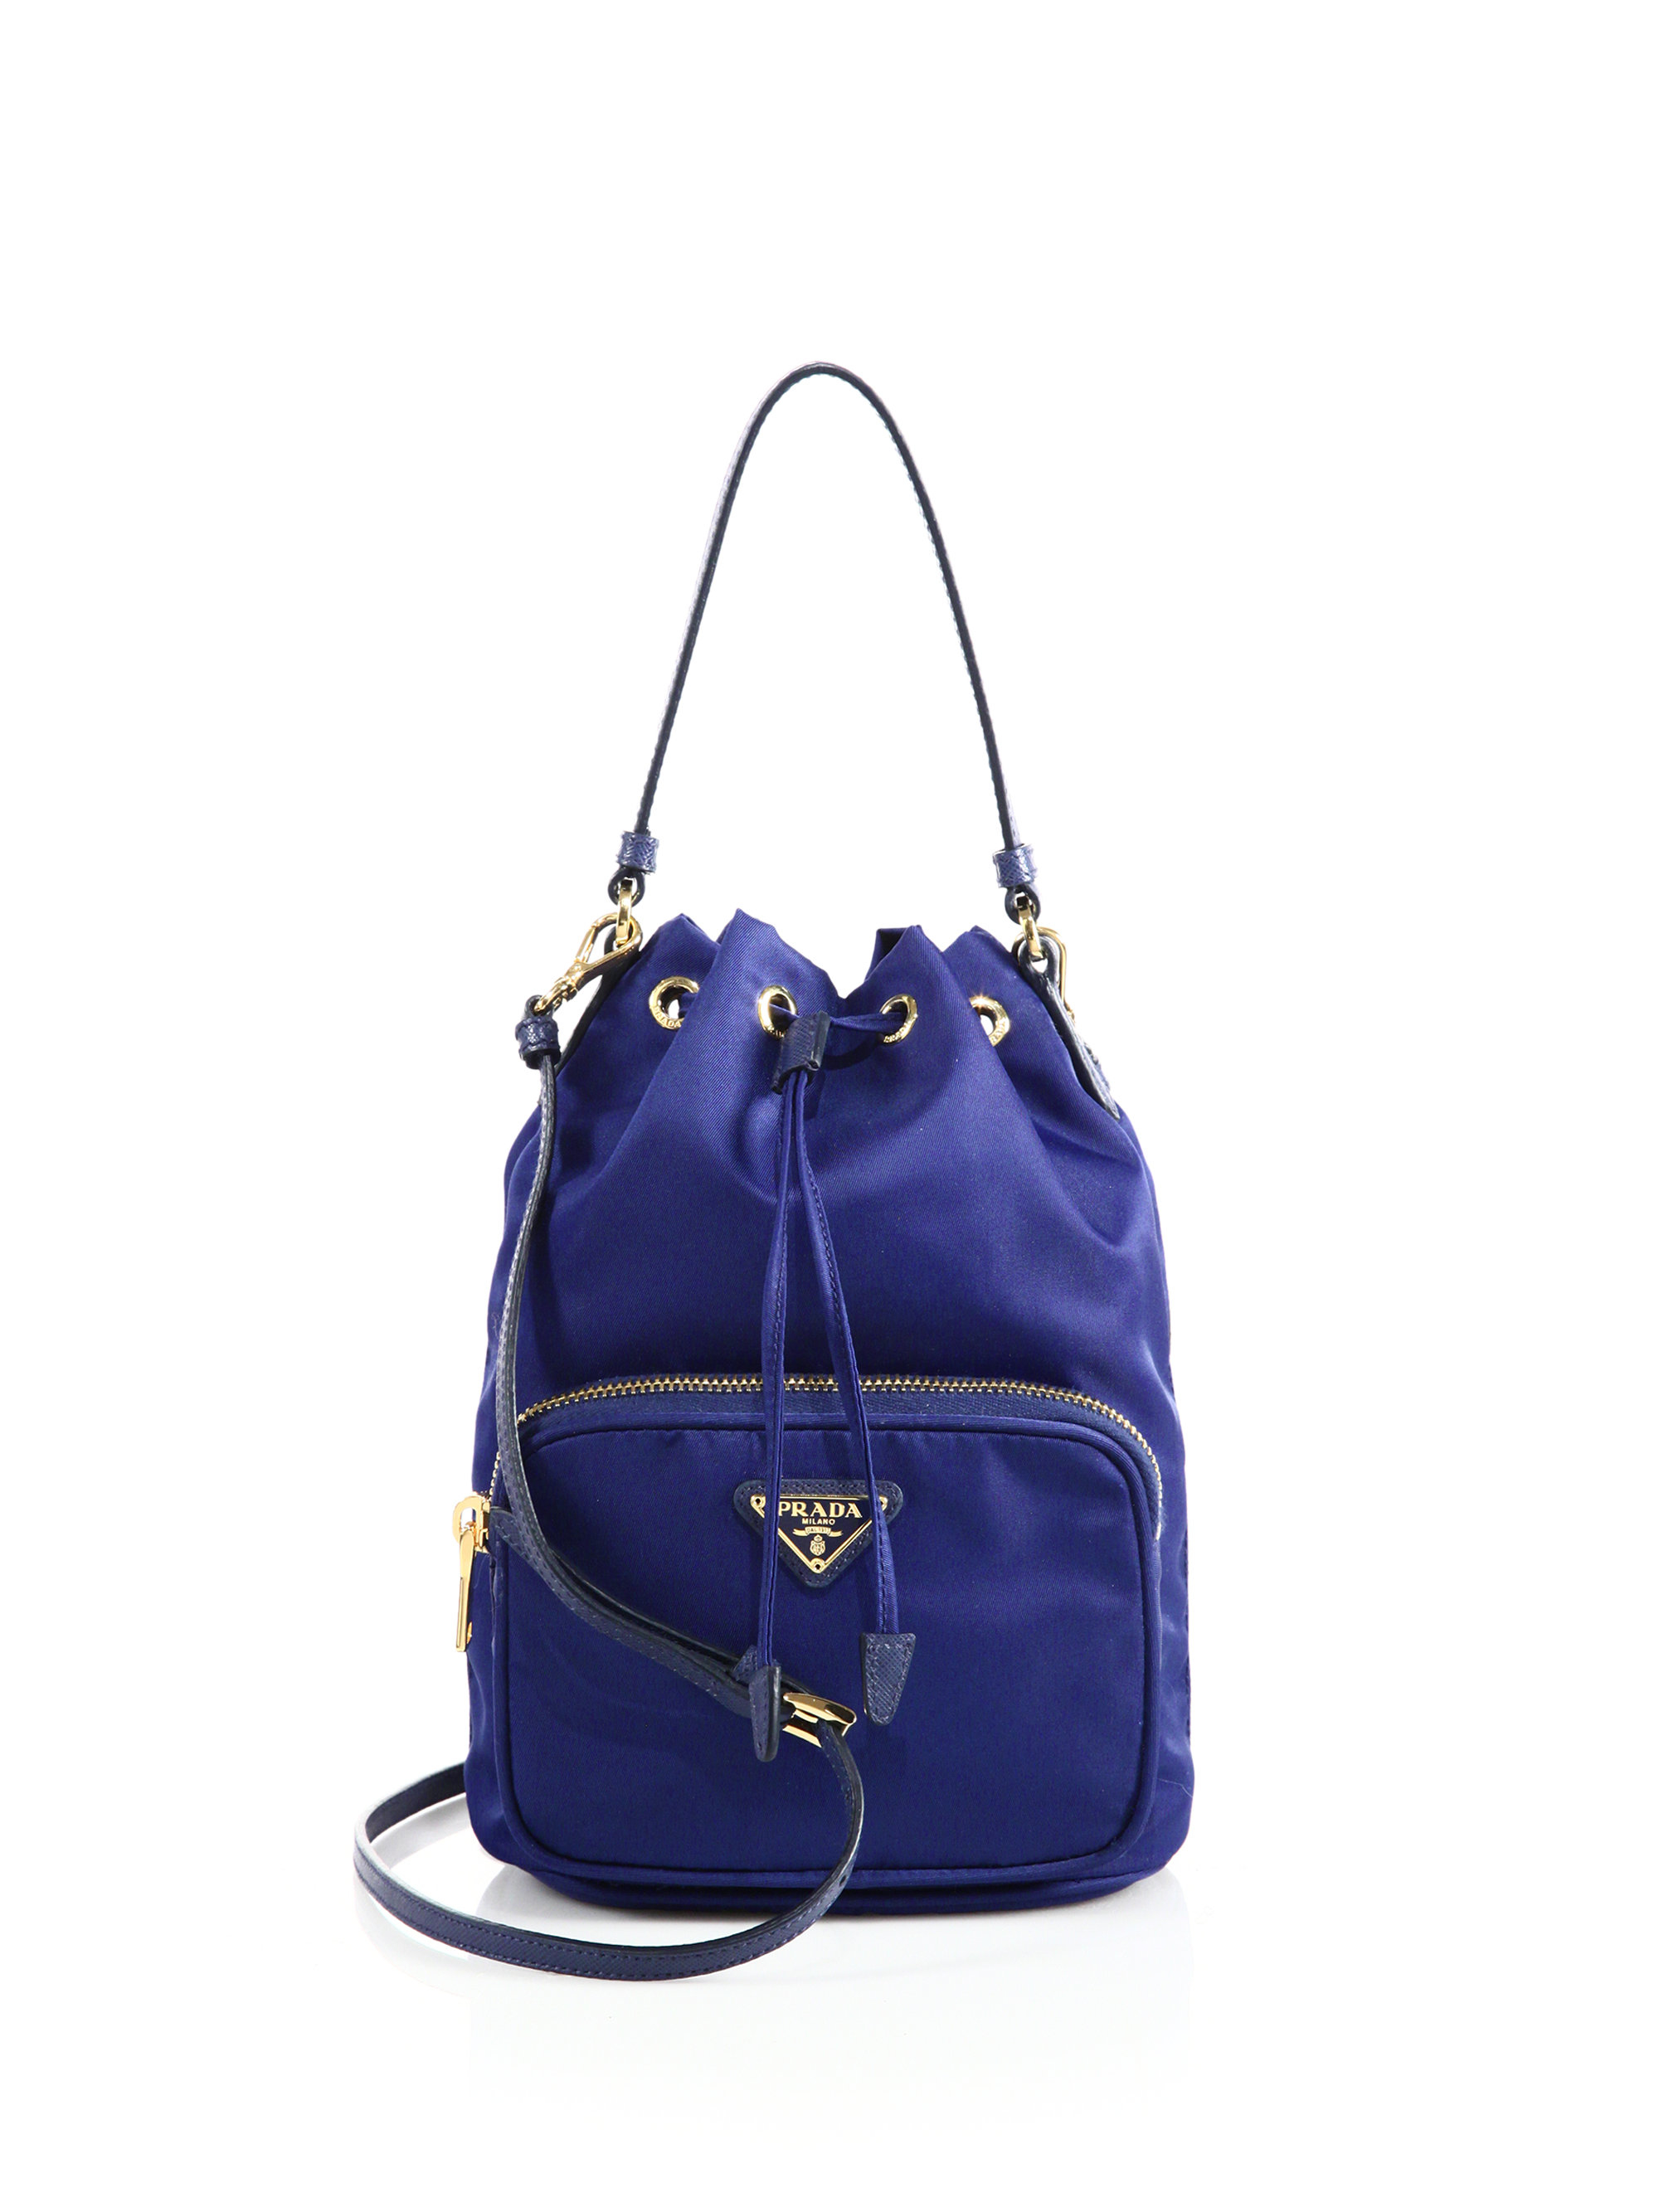 Bucket Prada bag collection exclusive photo